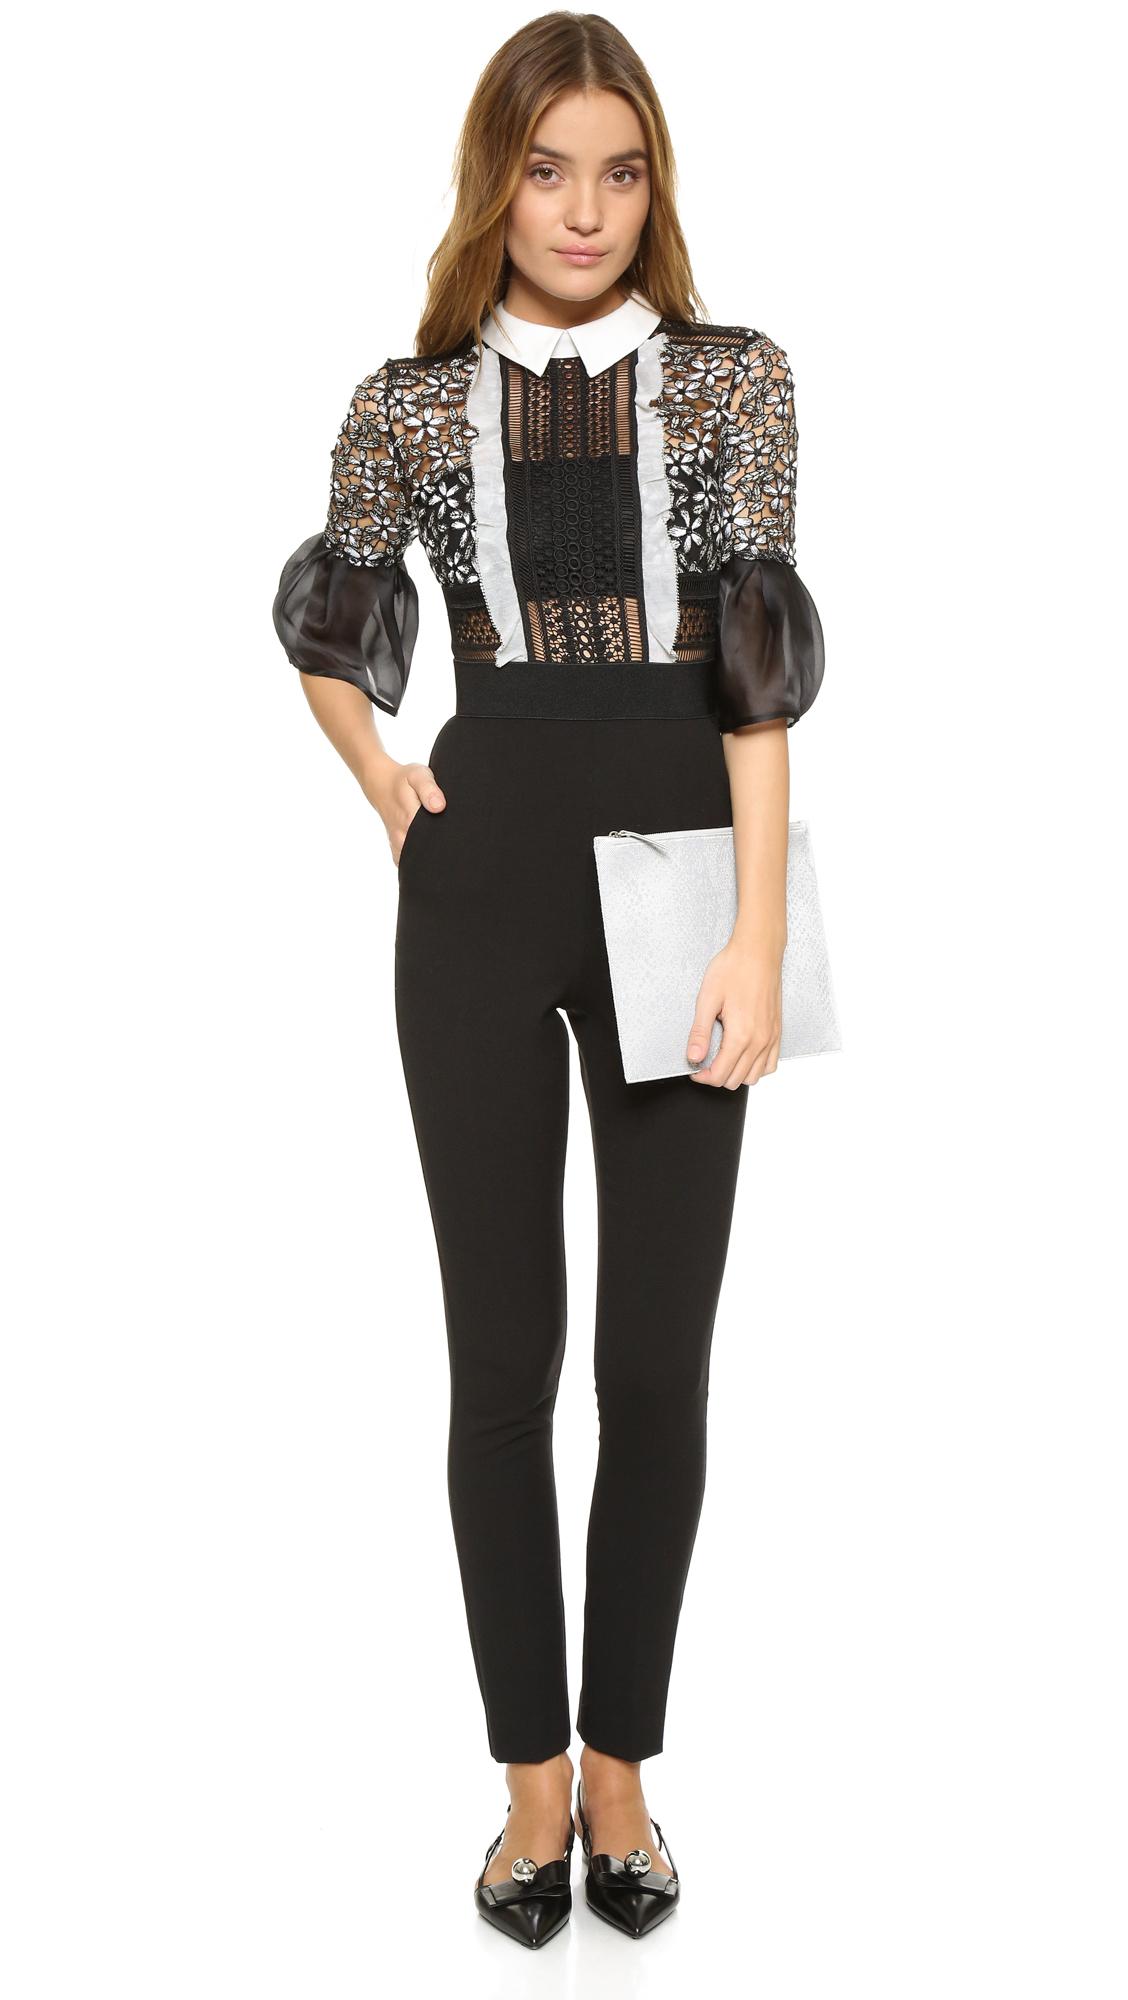 3066a803546 Lyst - Self-Portrait Bell Sleeve Jumpsuit in Black